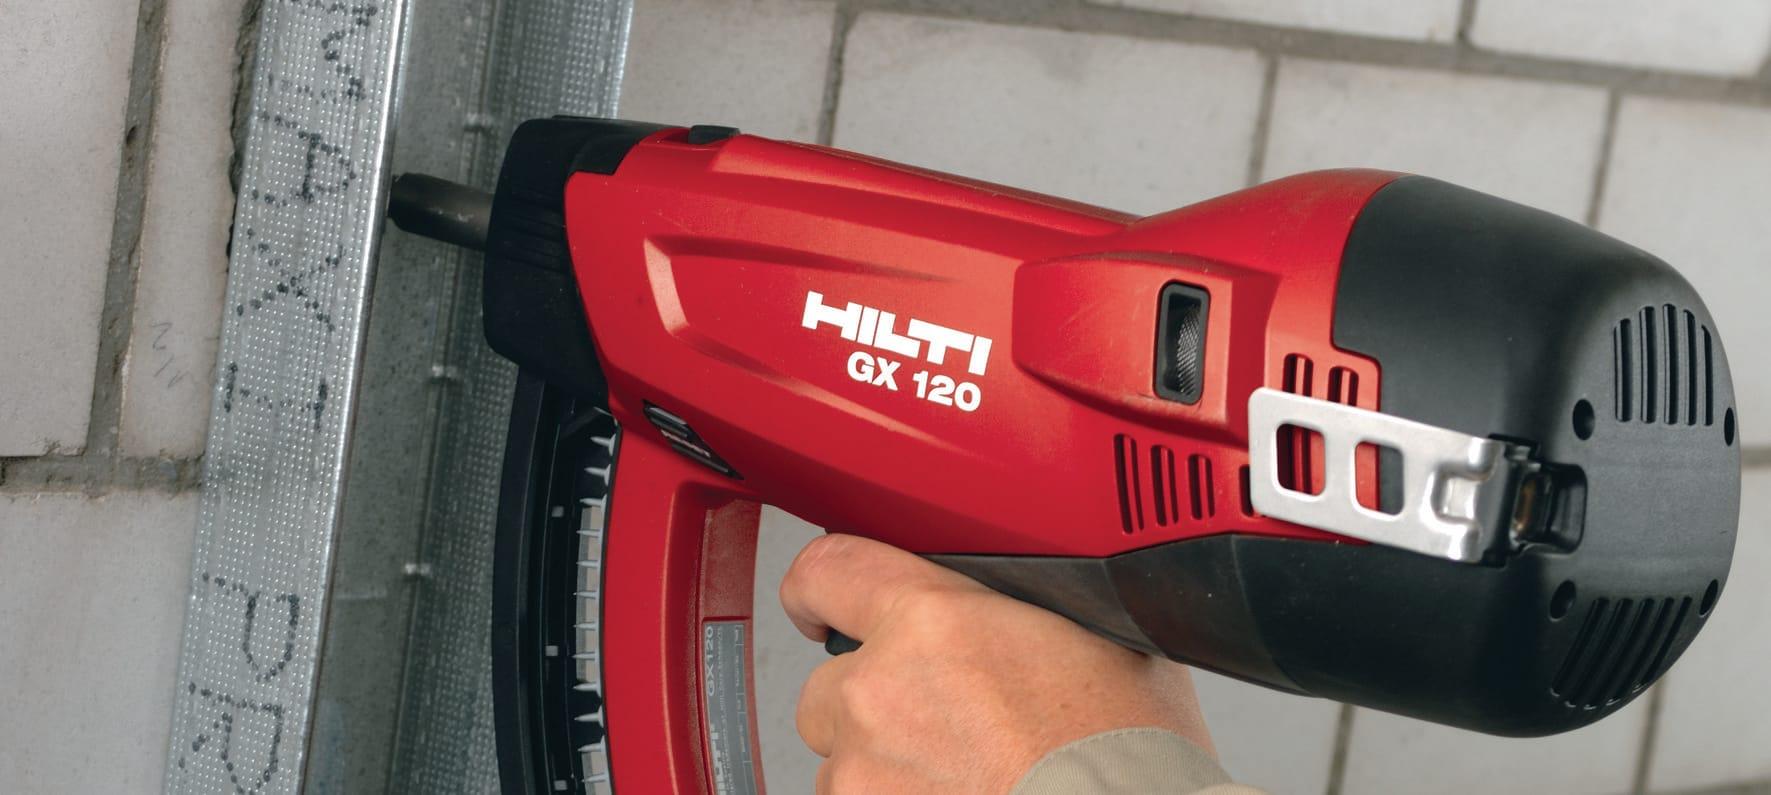 Gaskartusche GC 21 750x HILTI N/ägel X-GN 27MX 27mm GX 120 inkl